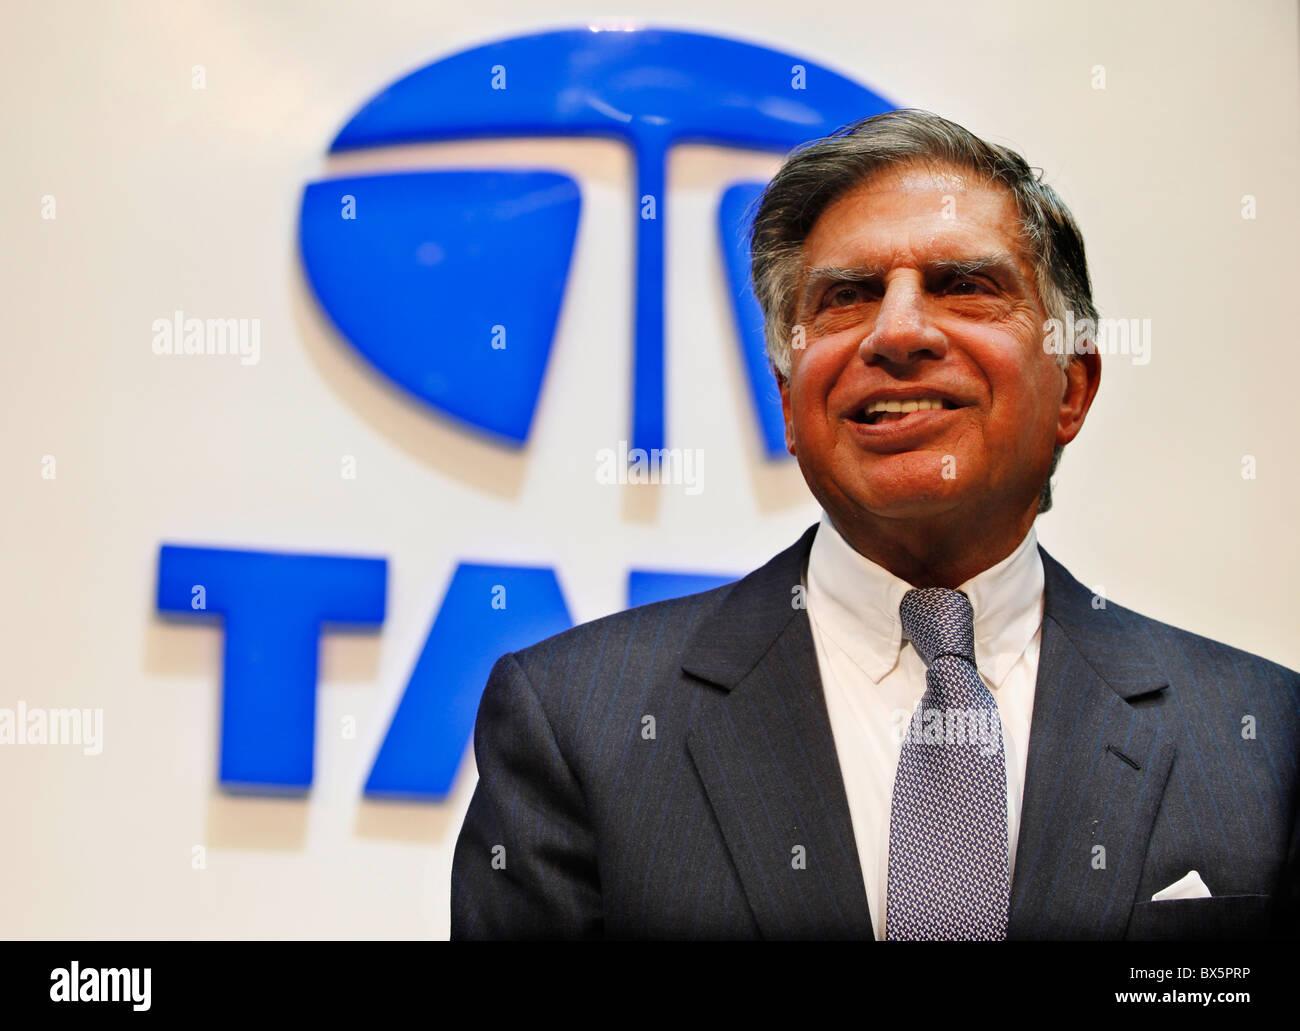 Atan N. Tata durante la 79th International Motor Show di Ginevra, Martedì, 3 marzo 2009. (CTK foto/Rene Fluger) Immagini Stock